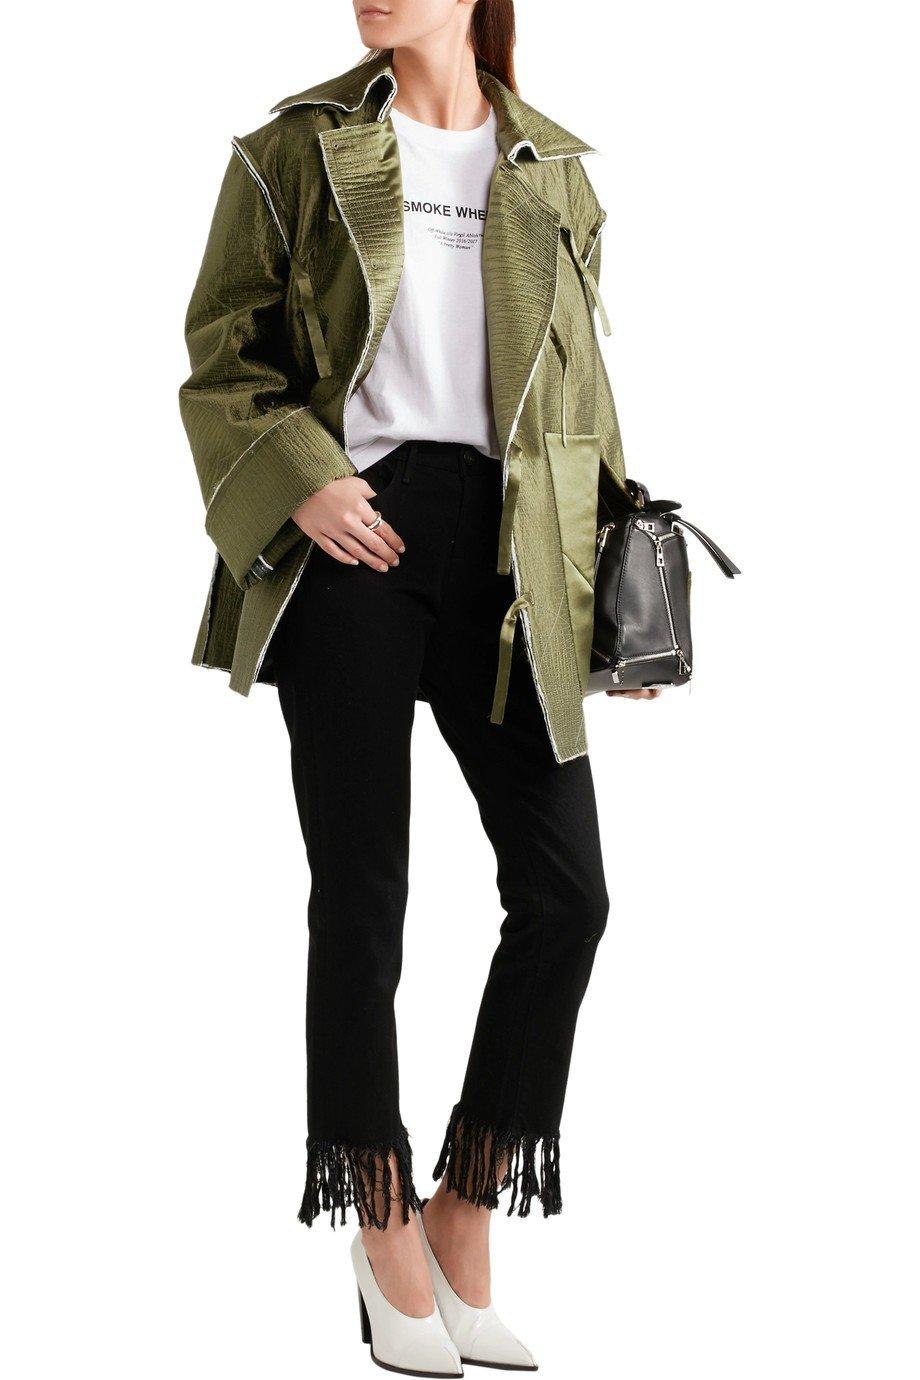 пиджак оверсайз цвета хаки женский 2018 фото новинки